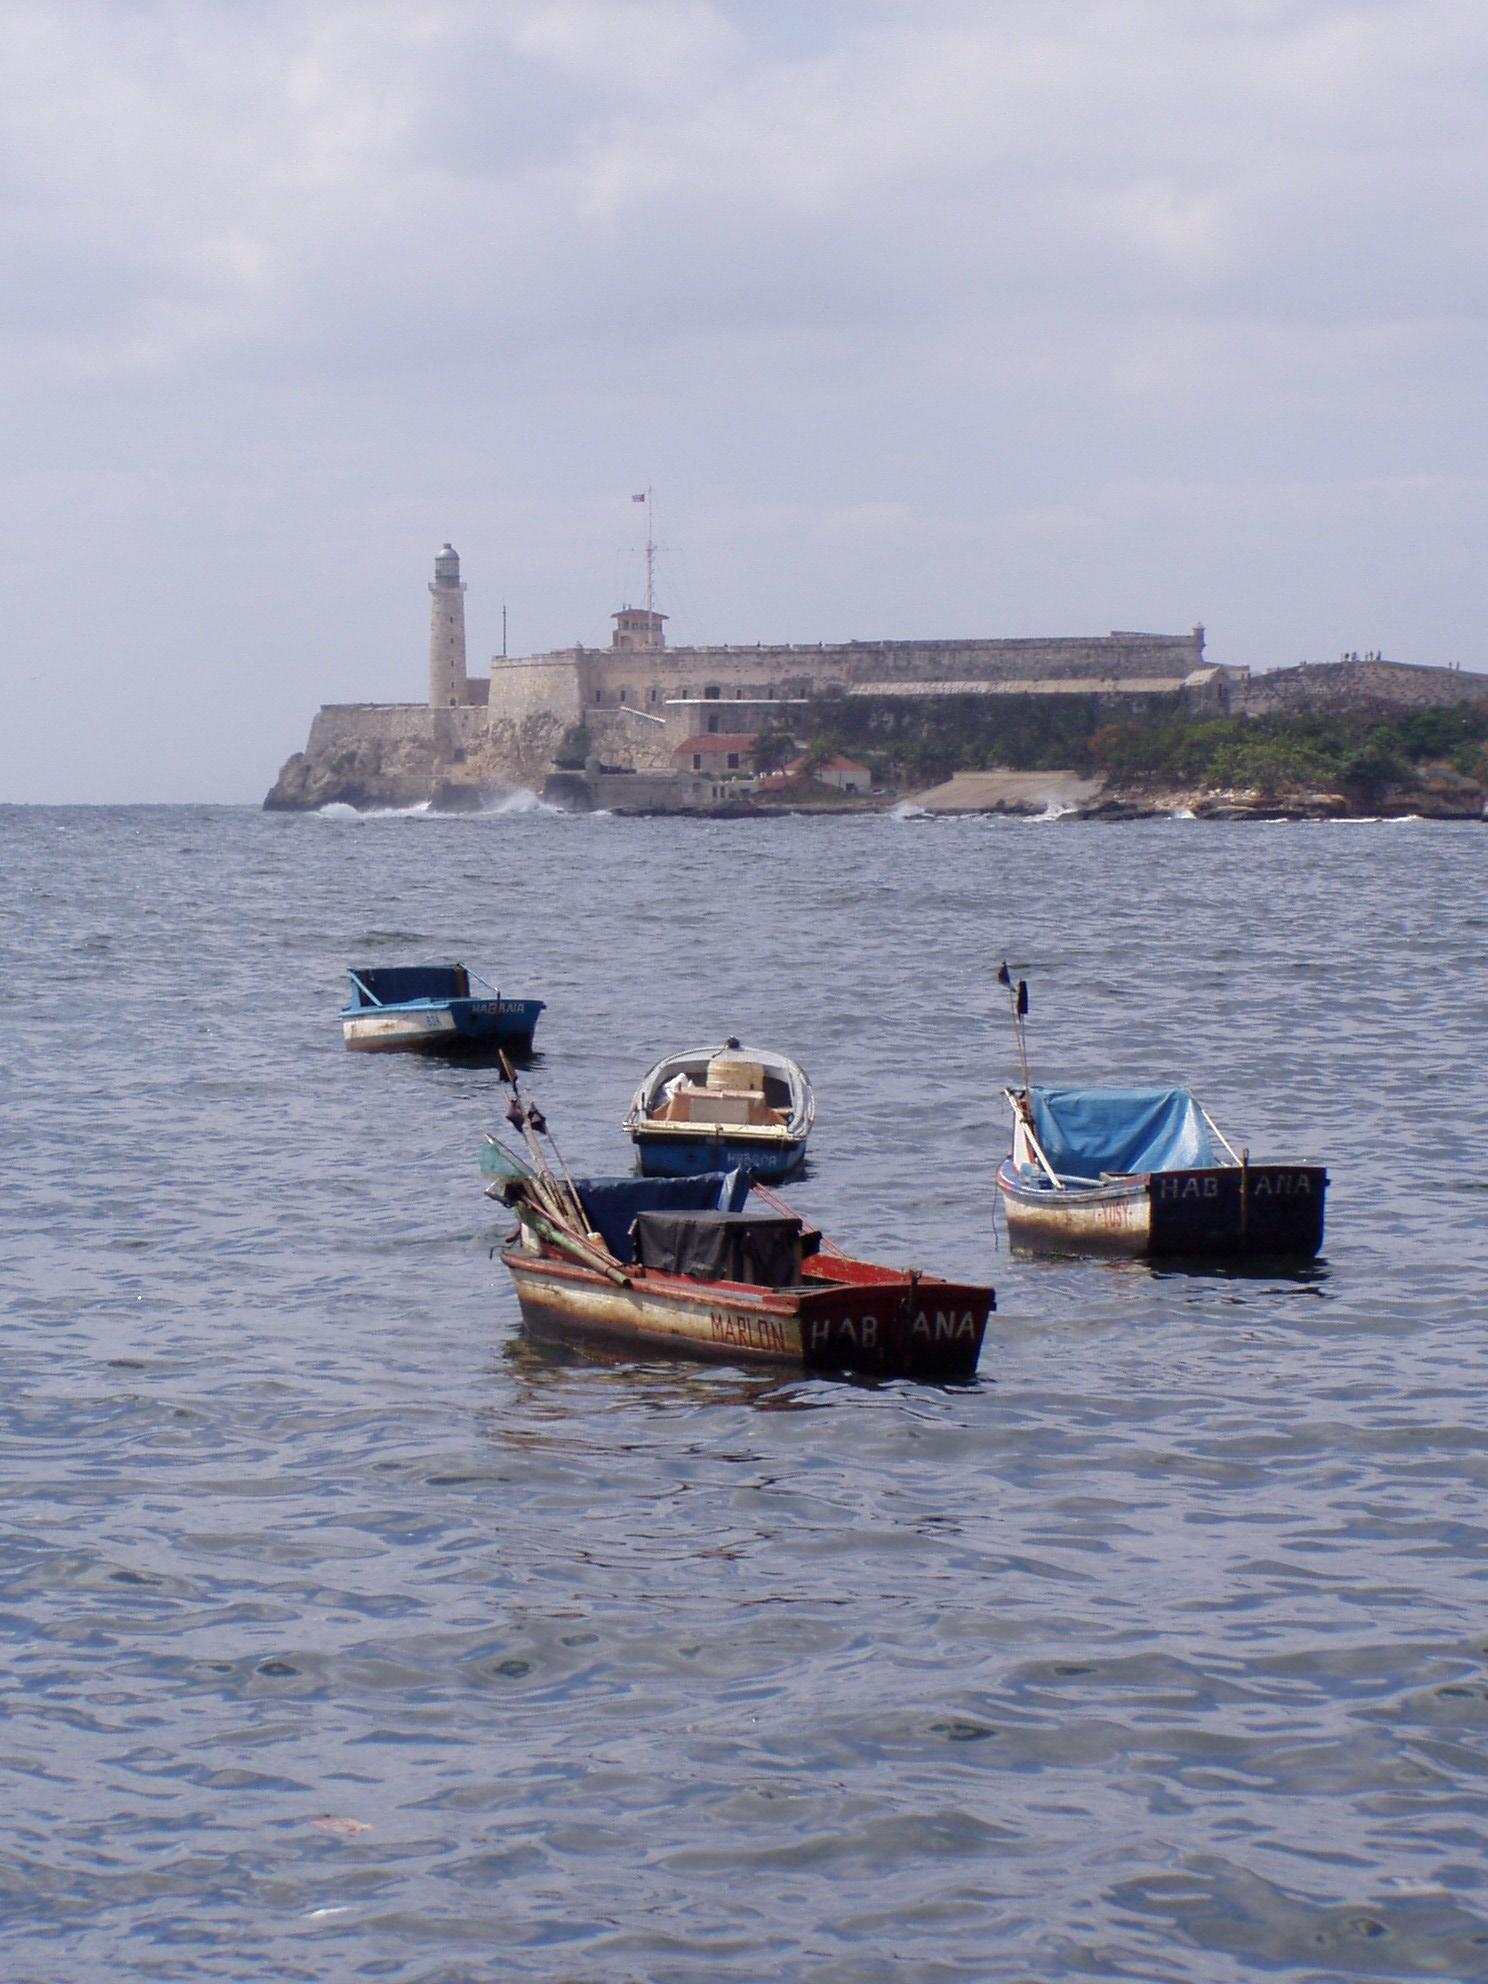 Cuba harbour